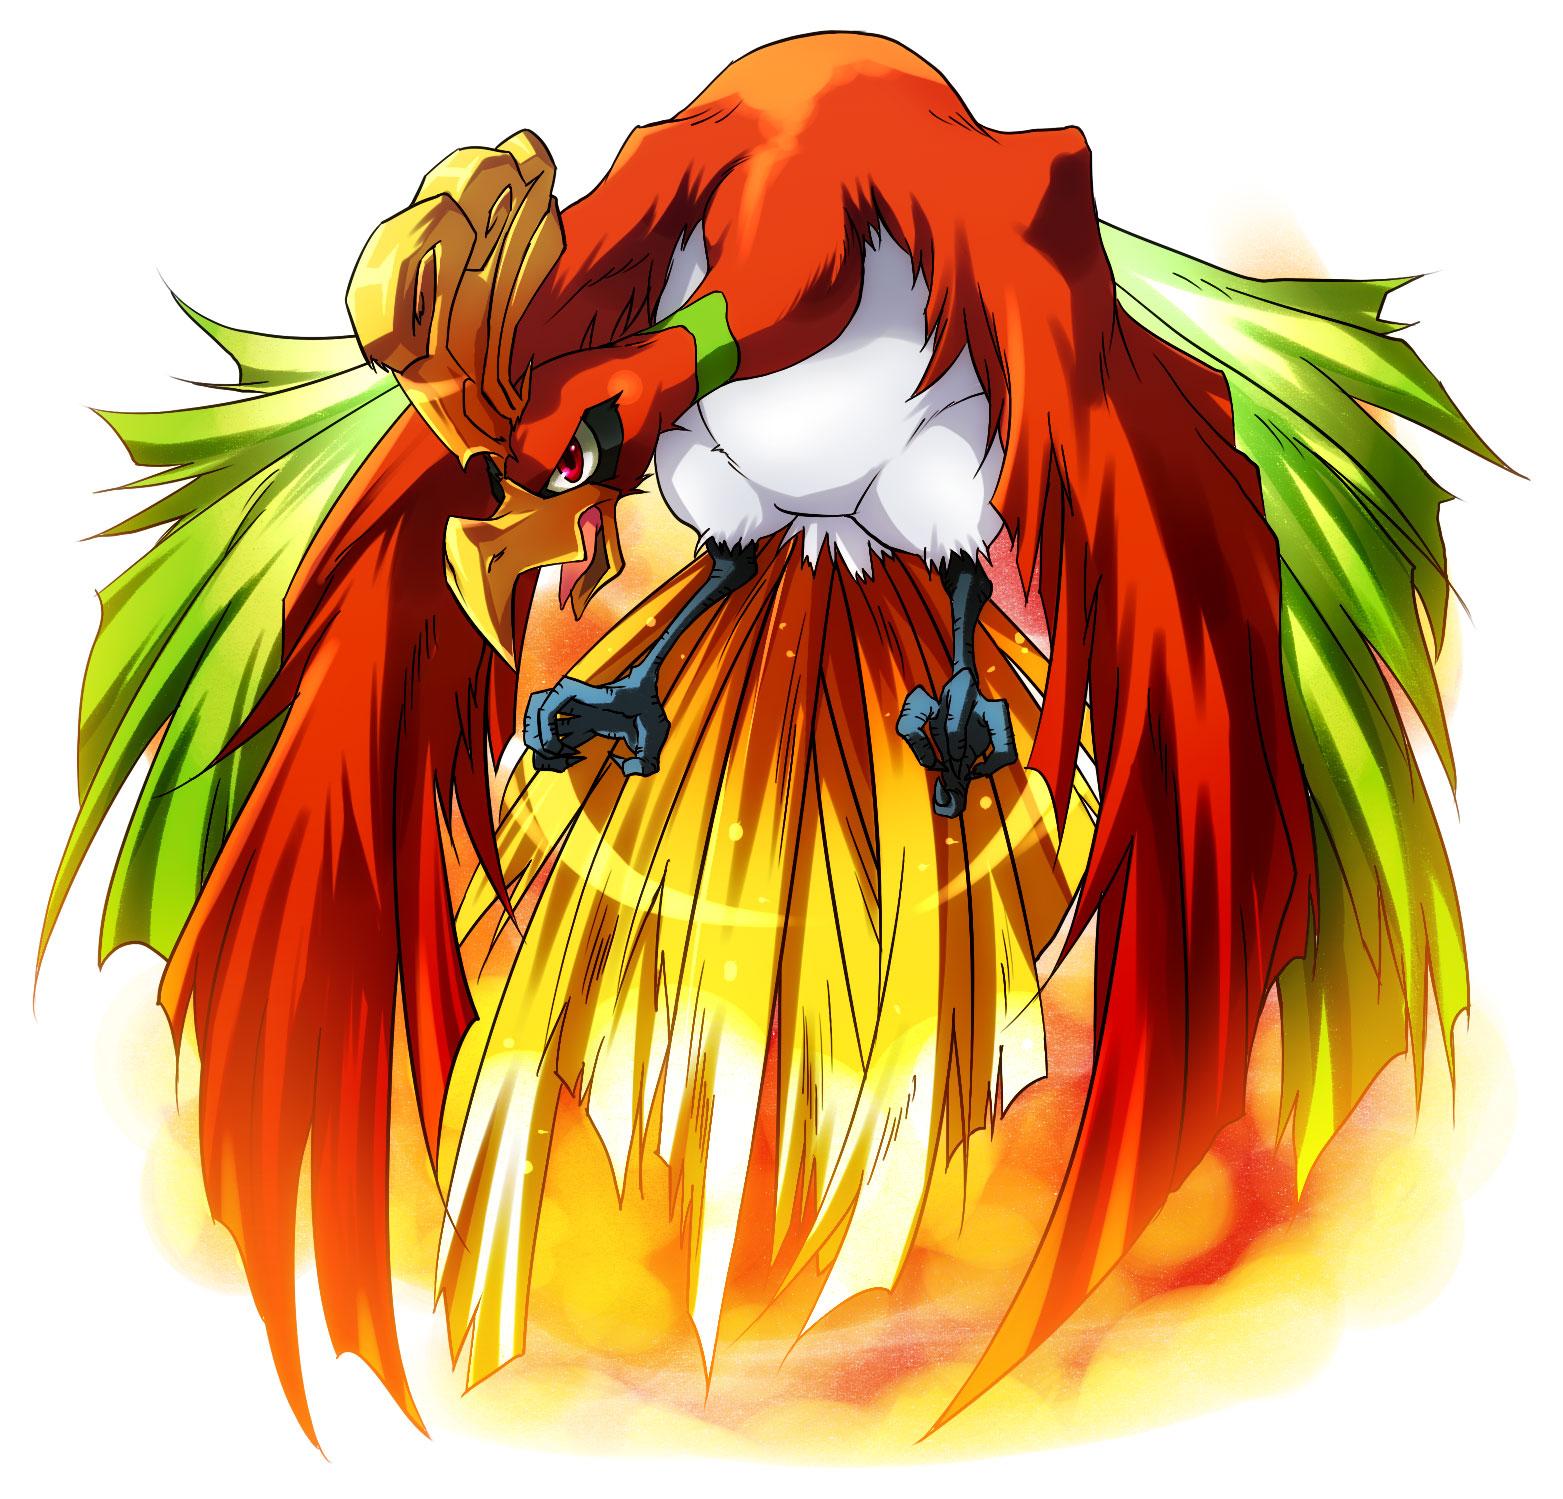 Ho Oh Pok 233 Mon Image 1226380 Zerochan Anime Image Board